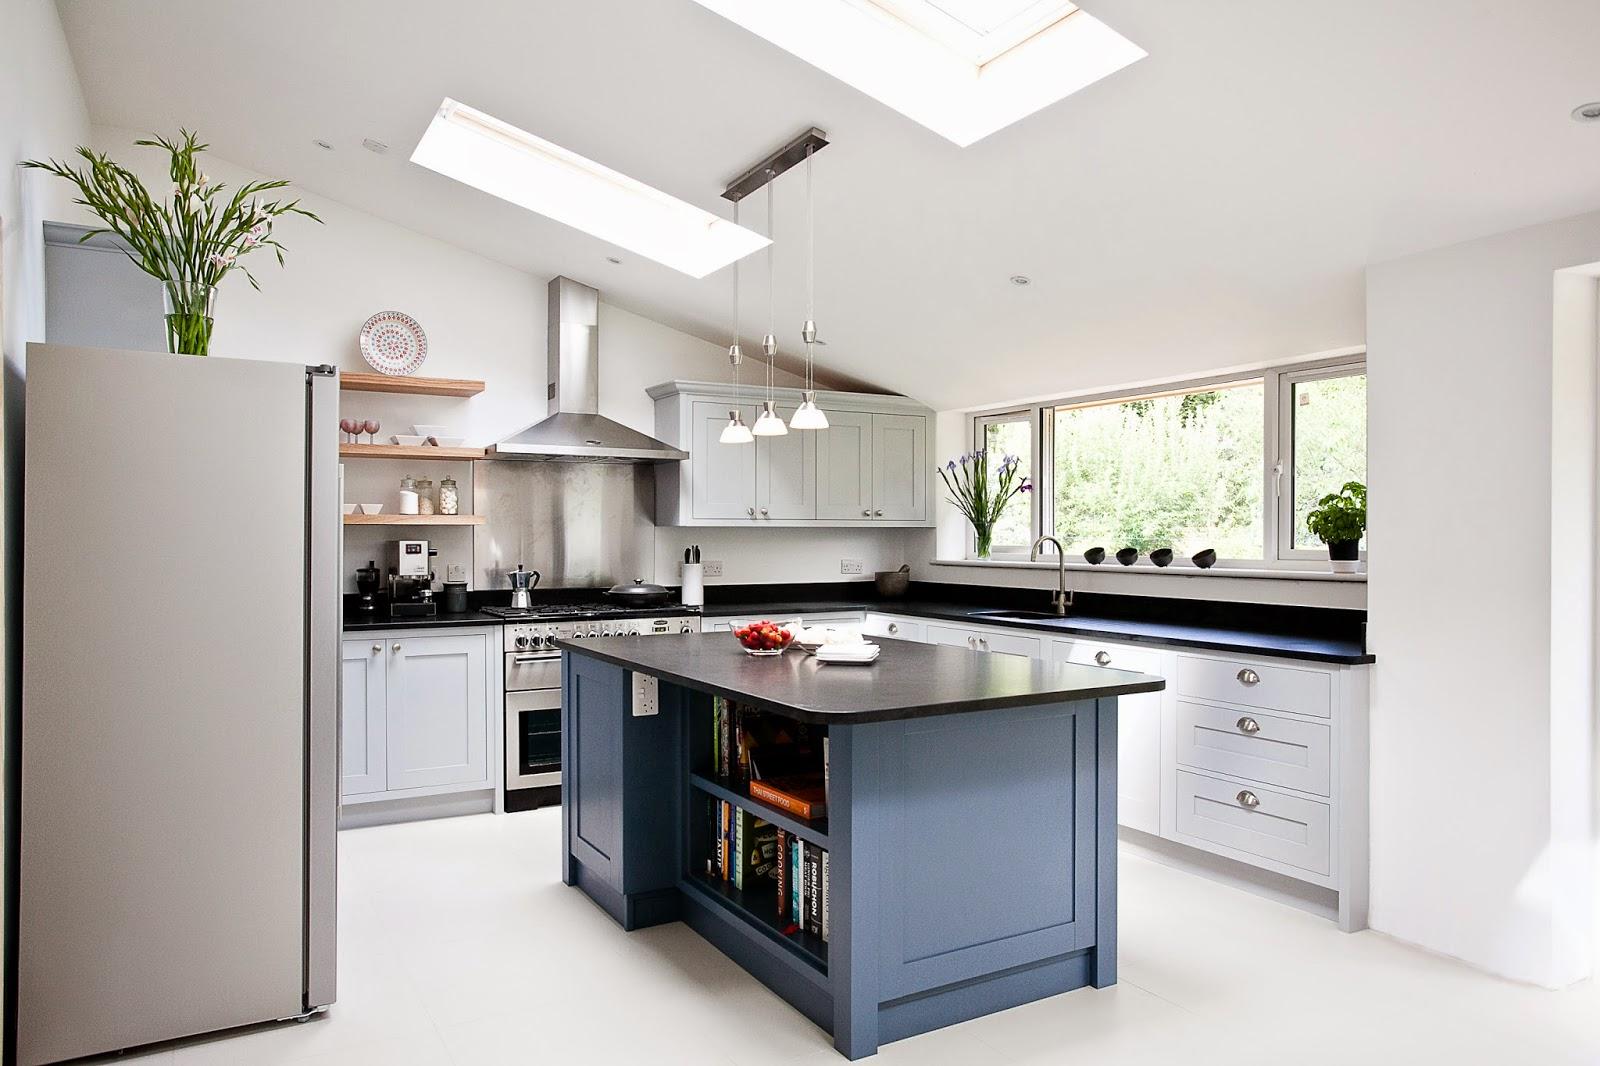 maple gray blue grey kitchen. Black Bedroom Furniture Sets. Home Design Ideas